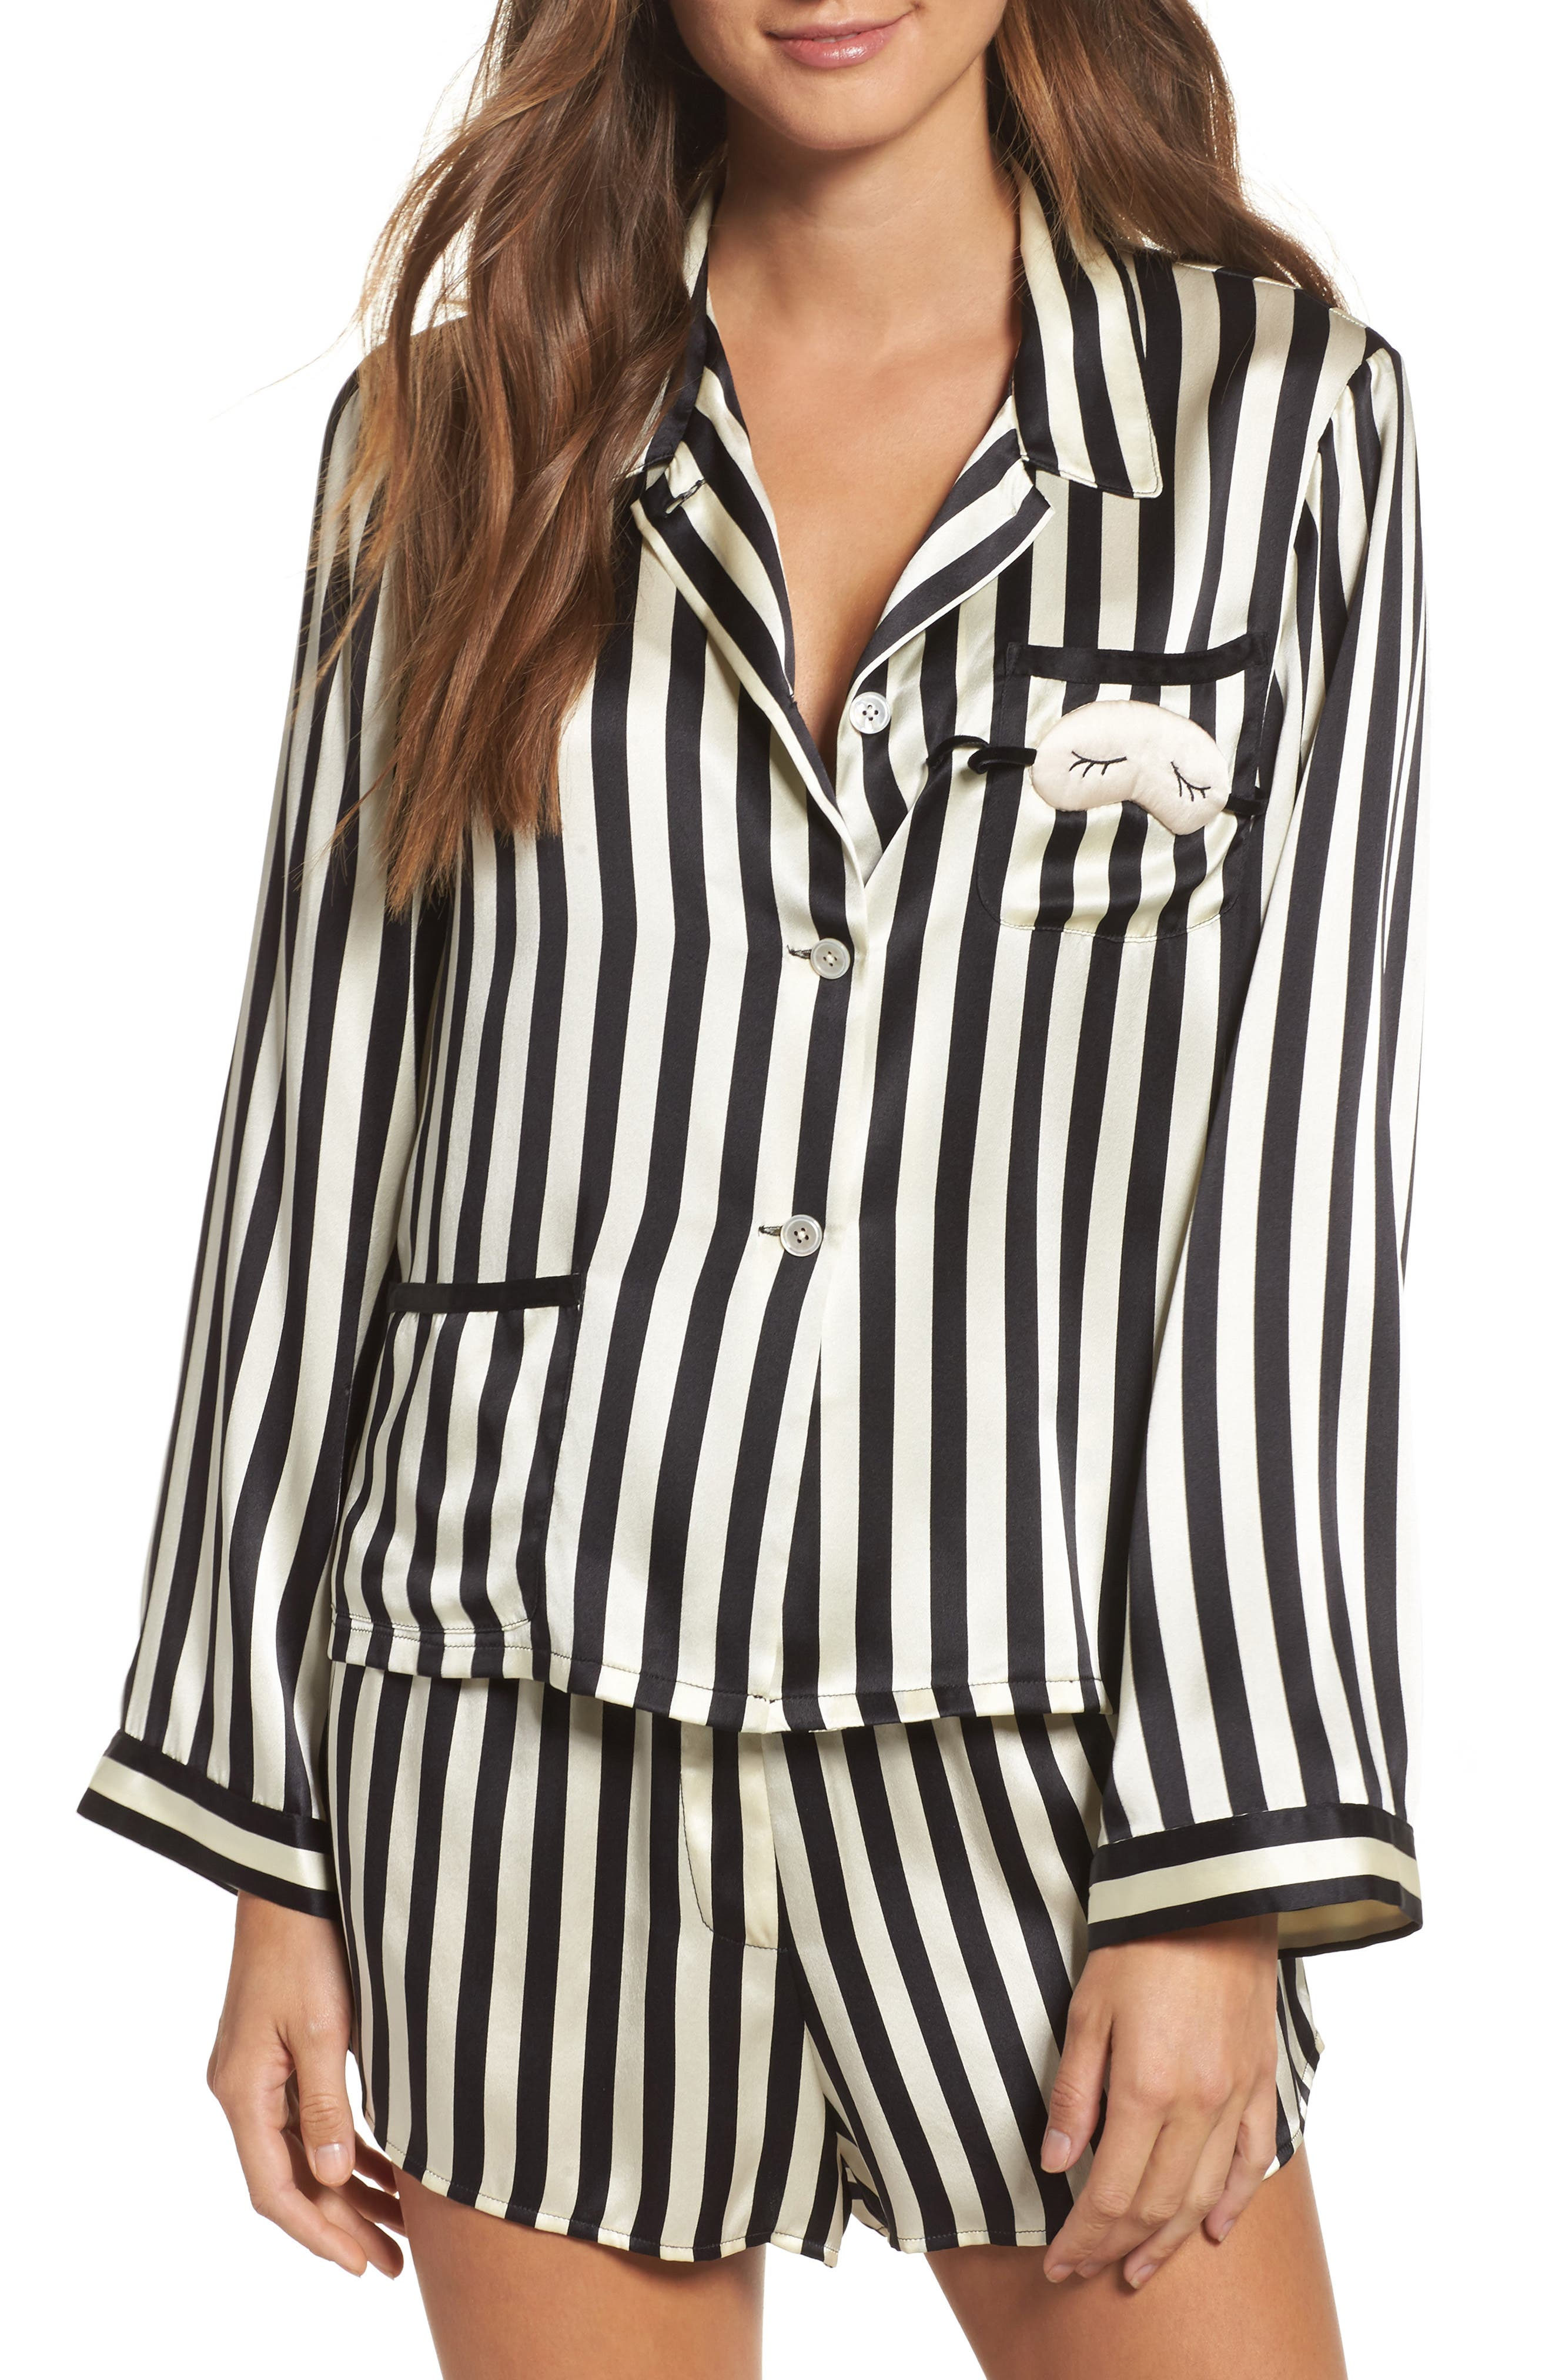 x Amanda Fatherazi Ruthie Mini Mask Stripe Pajama Top,                             Alternate thumbnail 5, color,                             Noir/ Ecru